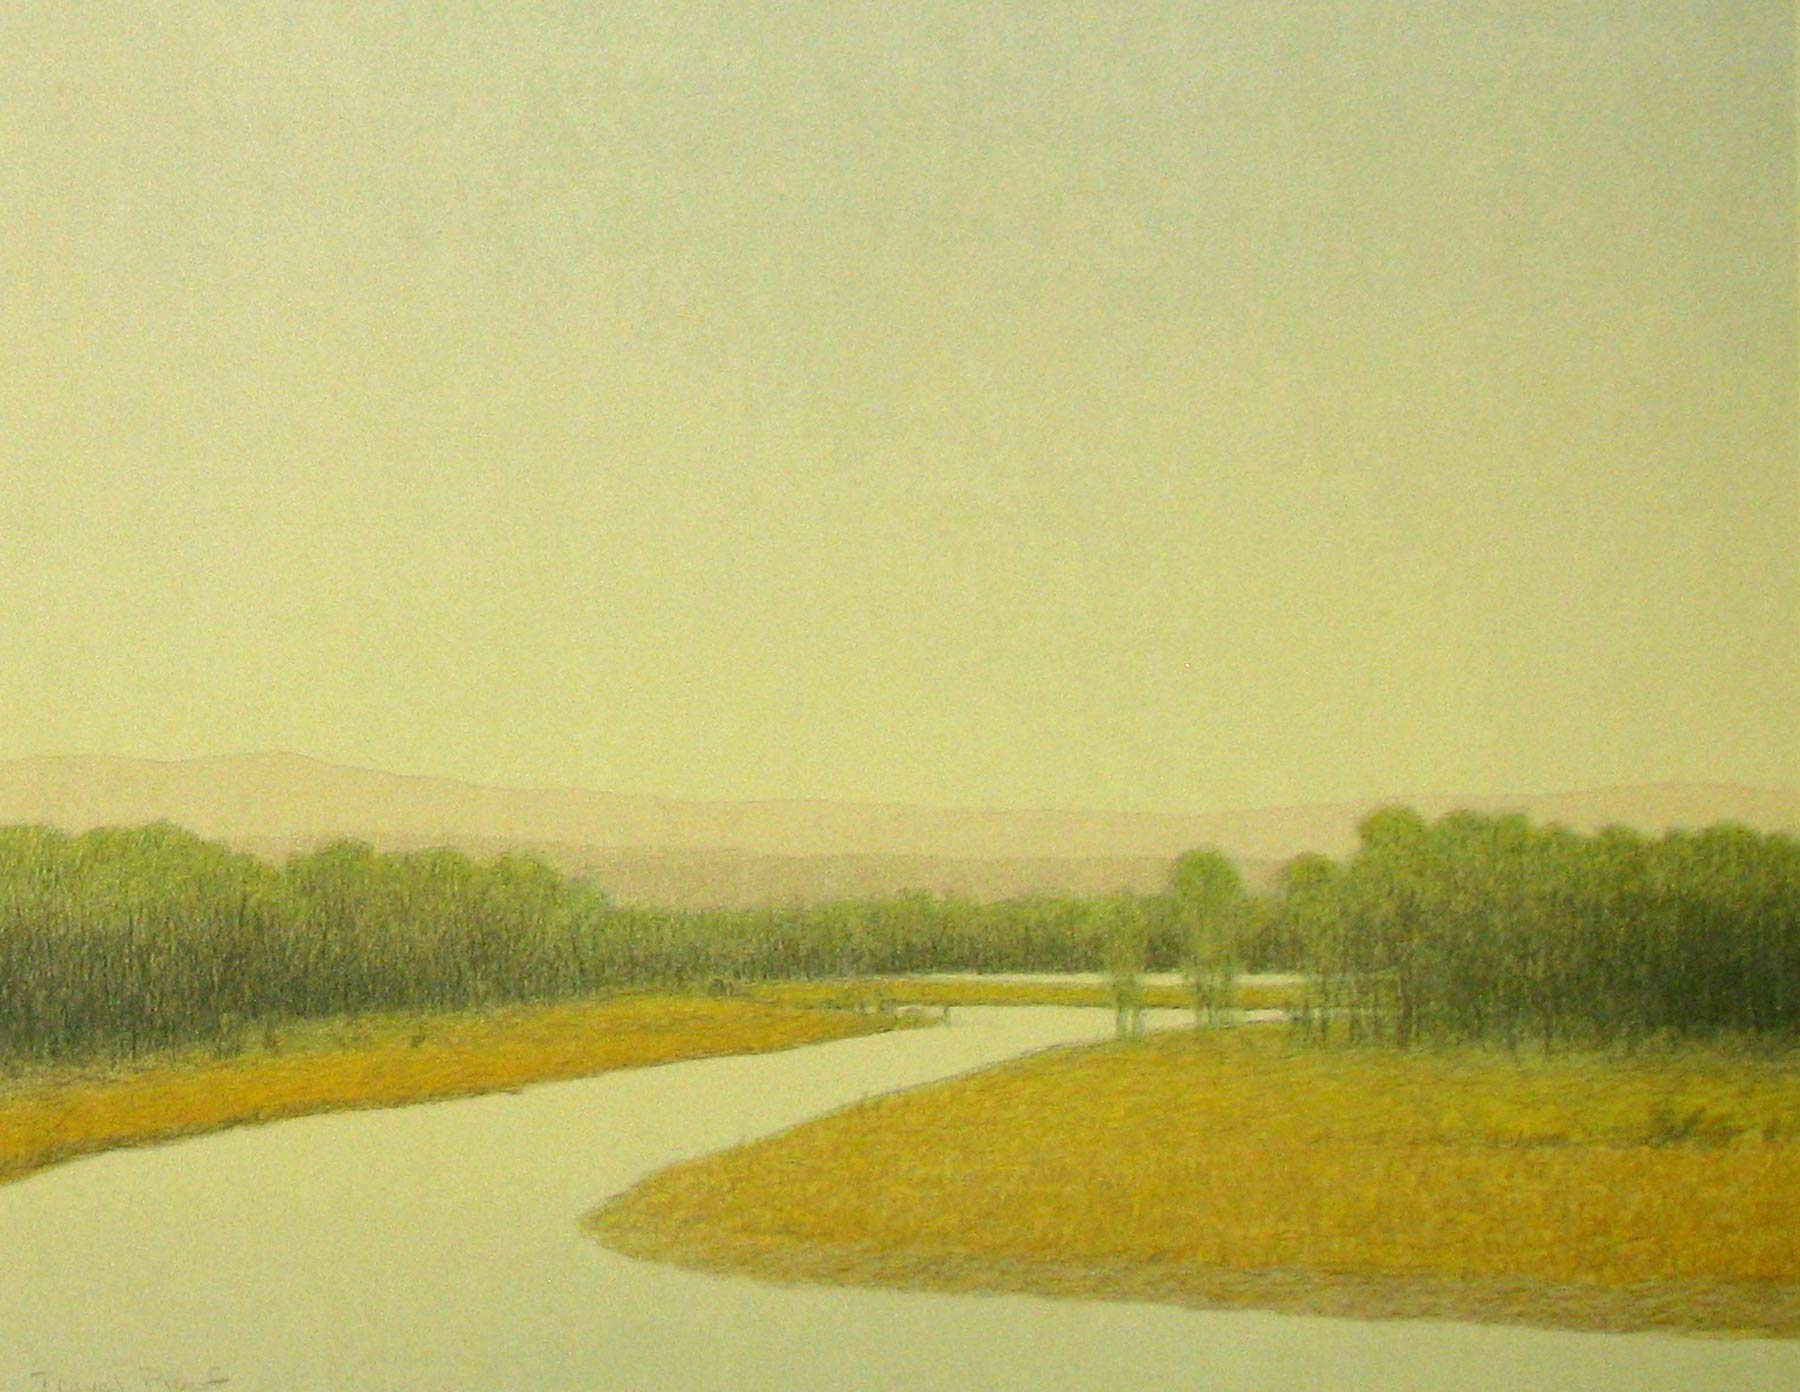 Chatham-Summer on the Clark Fork River